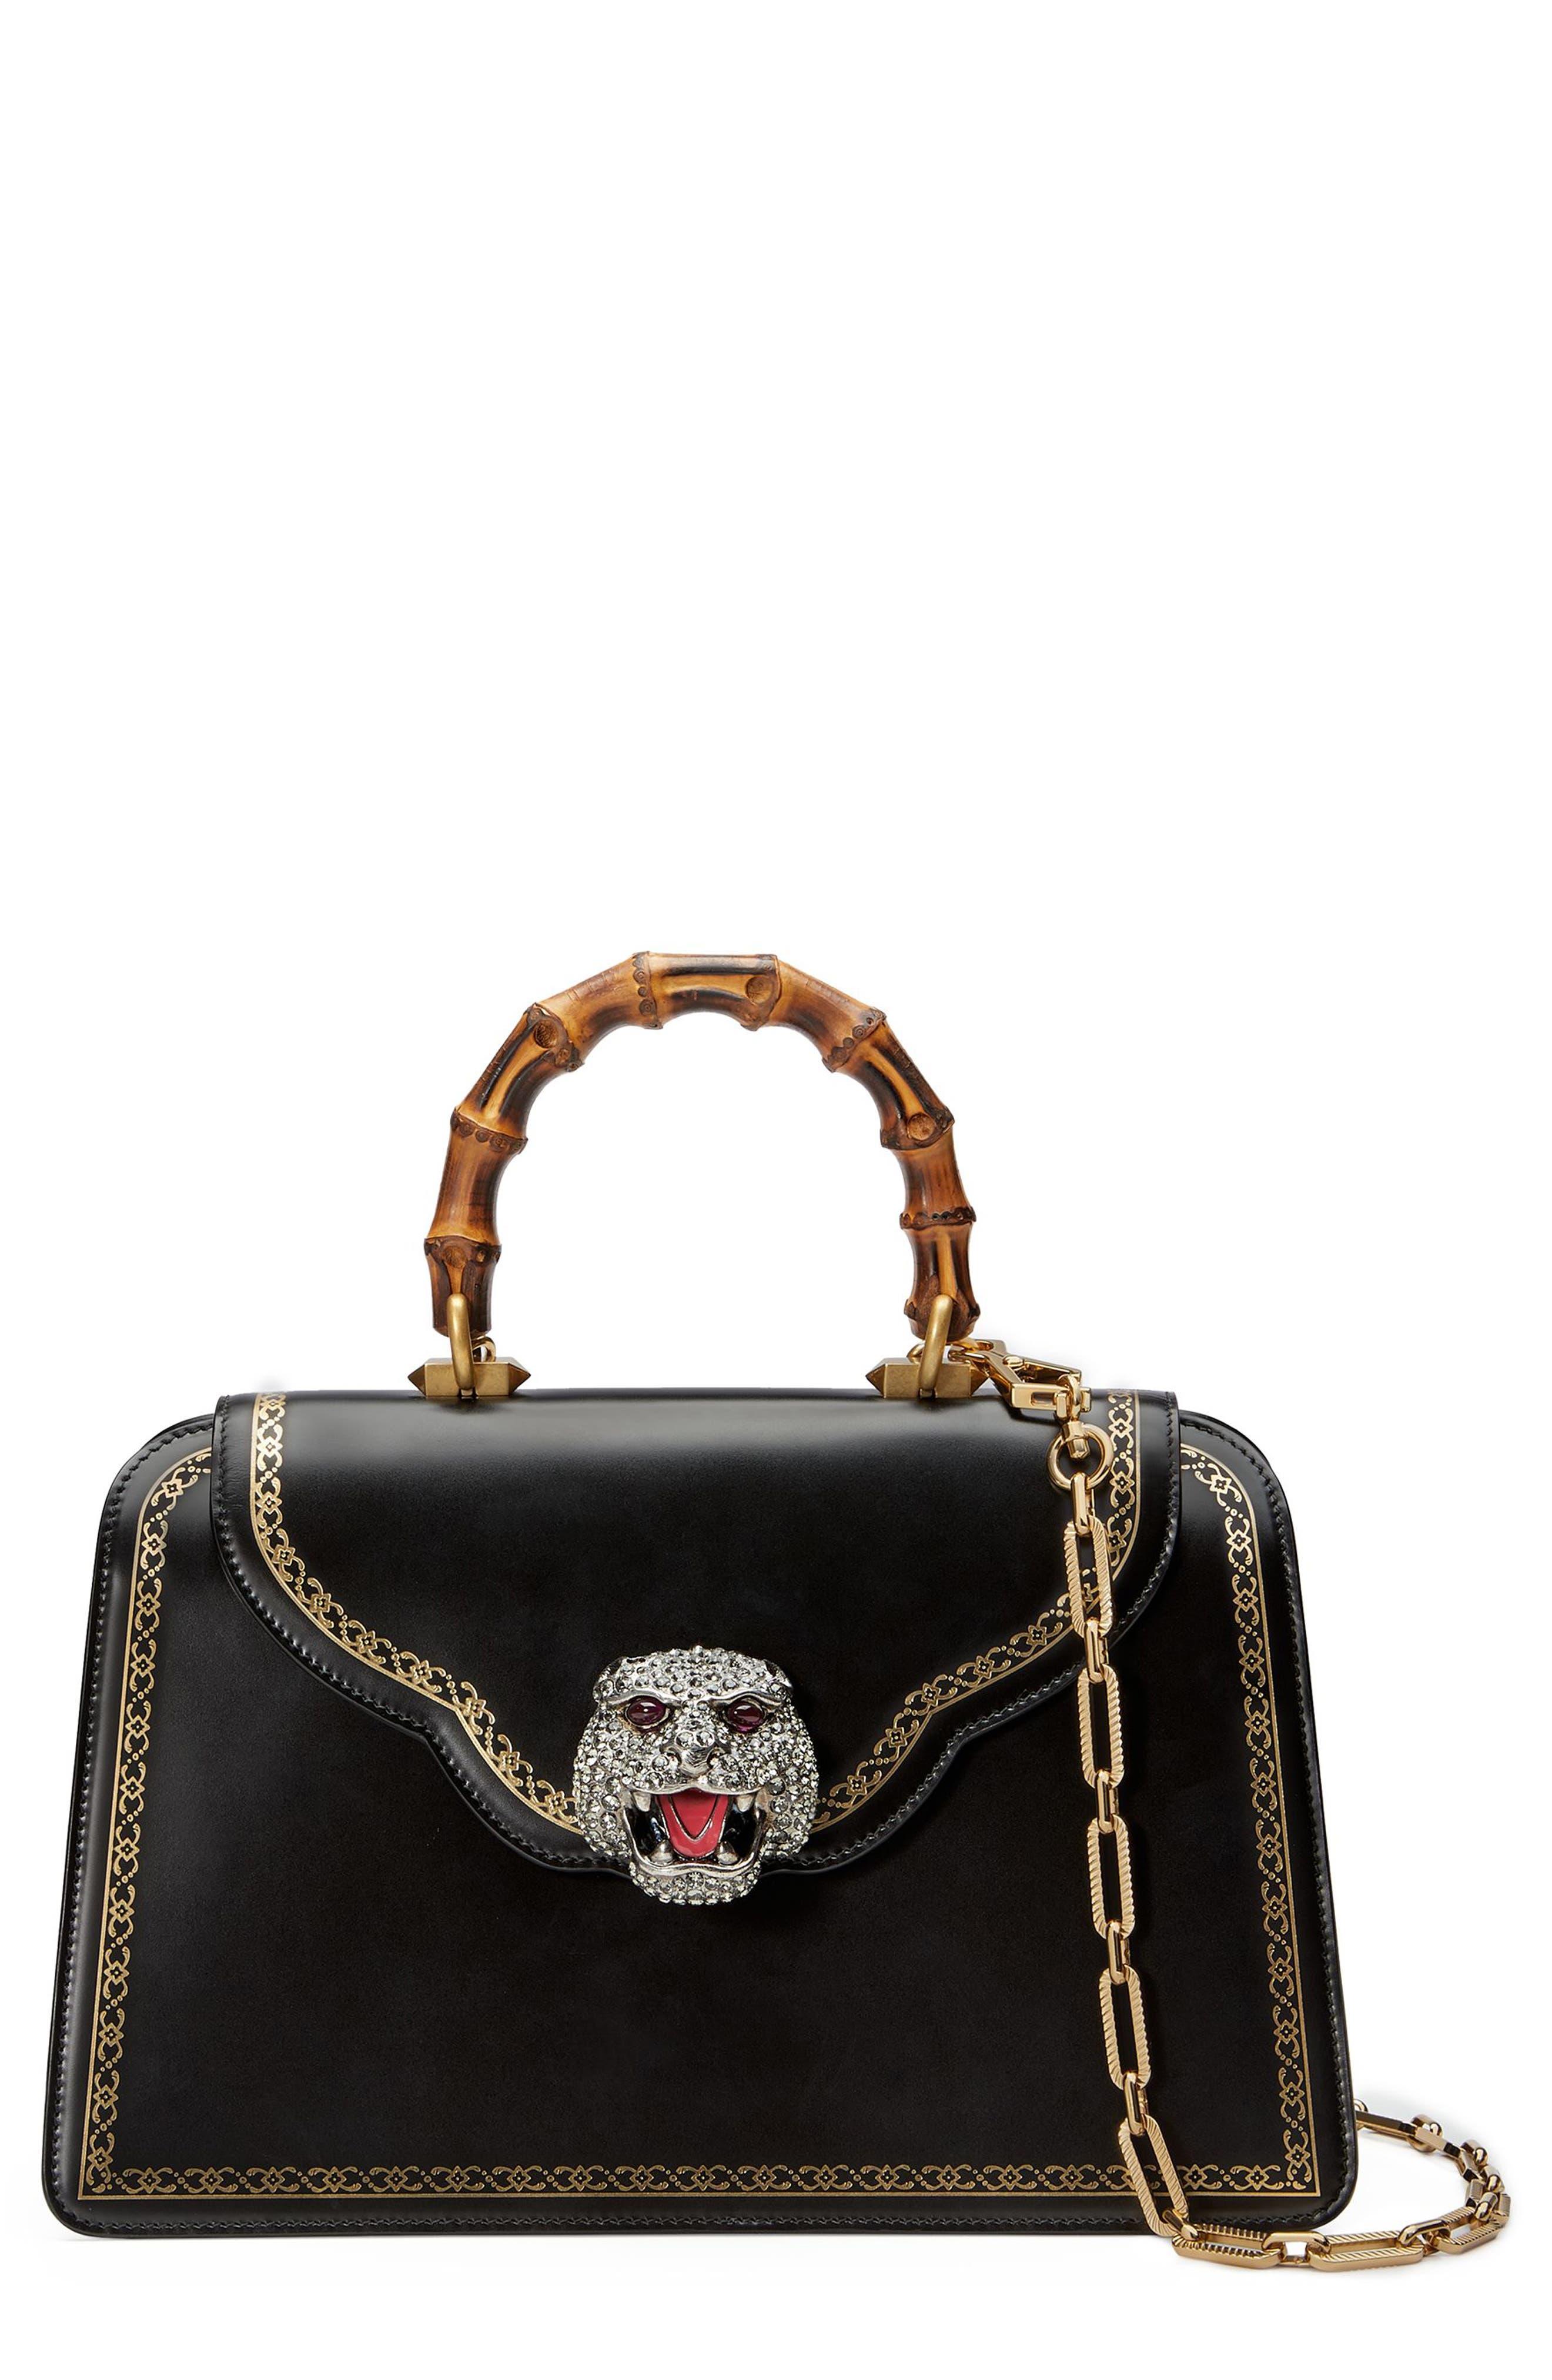 Alternate Image 1 Selected - Gucci Gatto Medium Top Handle Bag